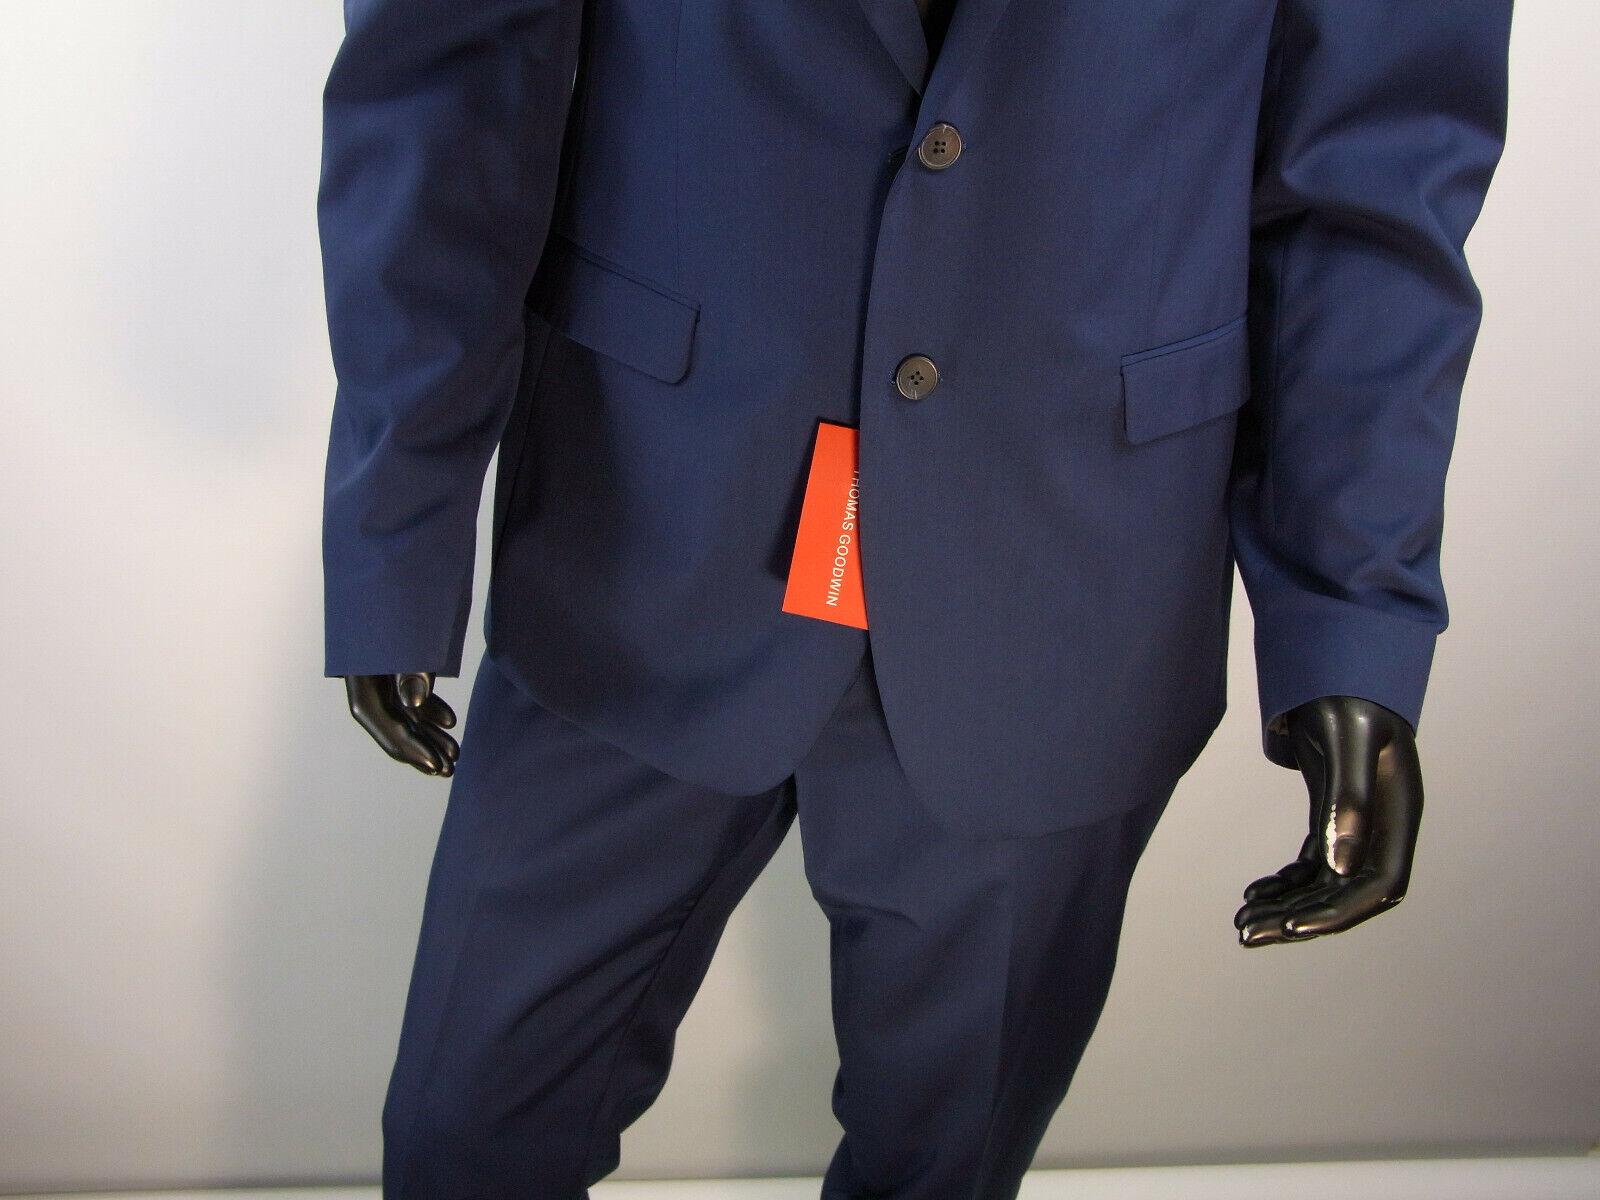 Herren Mode Anzug Thomas Goodwin Größe 114 Farbe Blau  Model 40